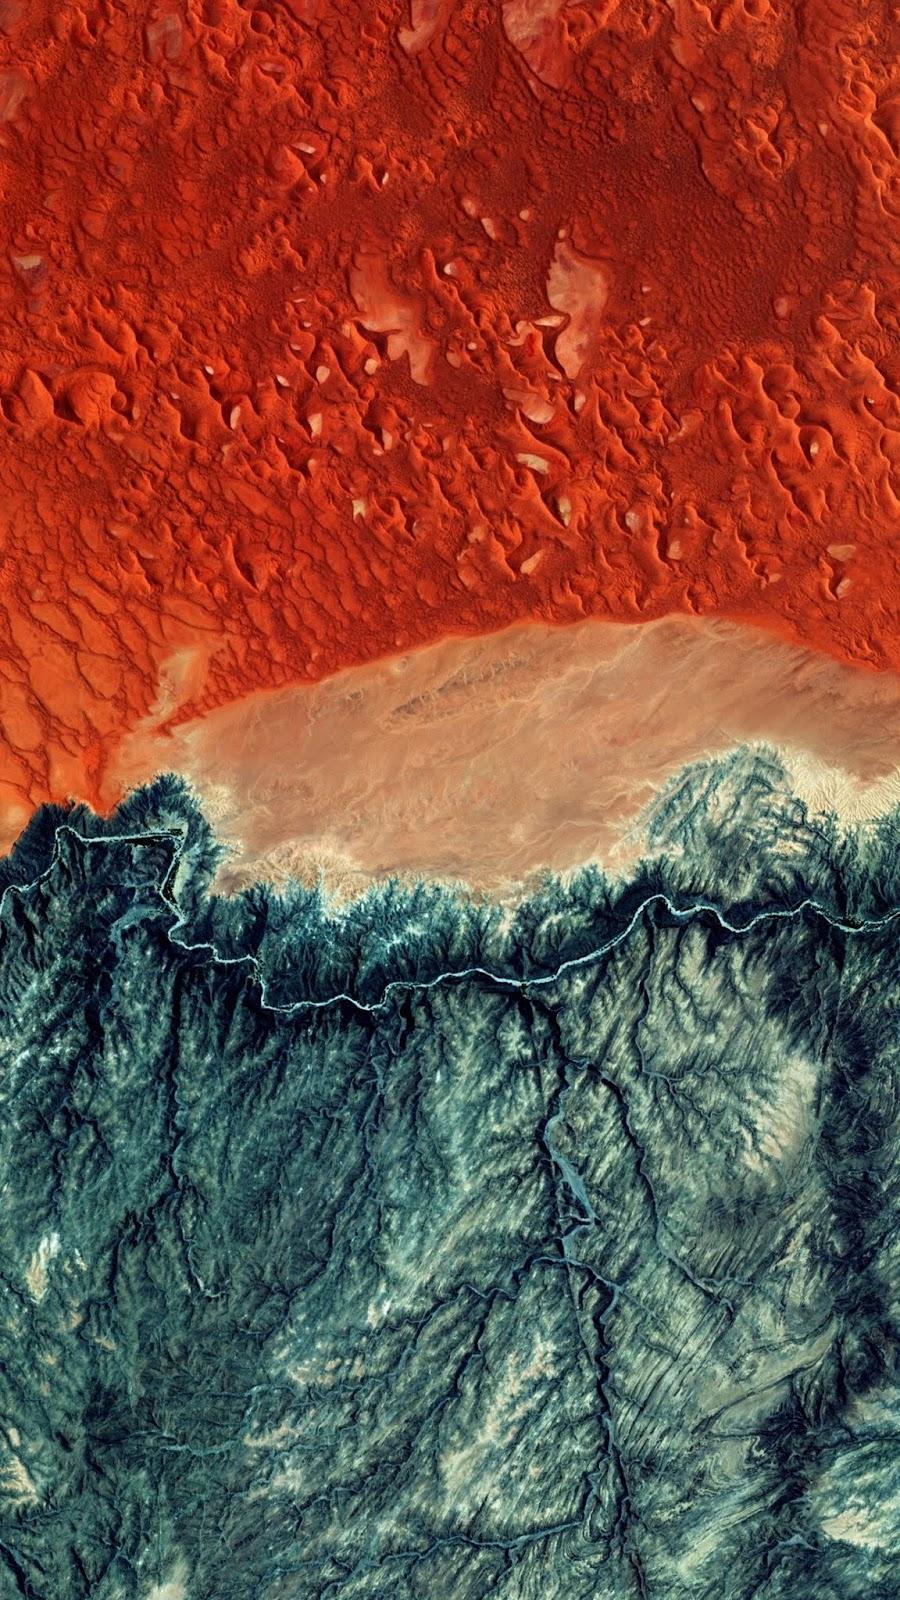 earth-wallpaper-dump